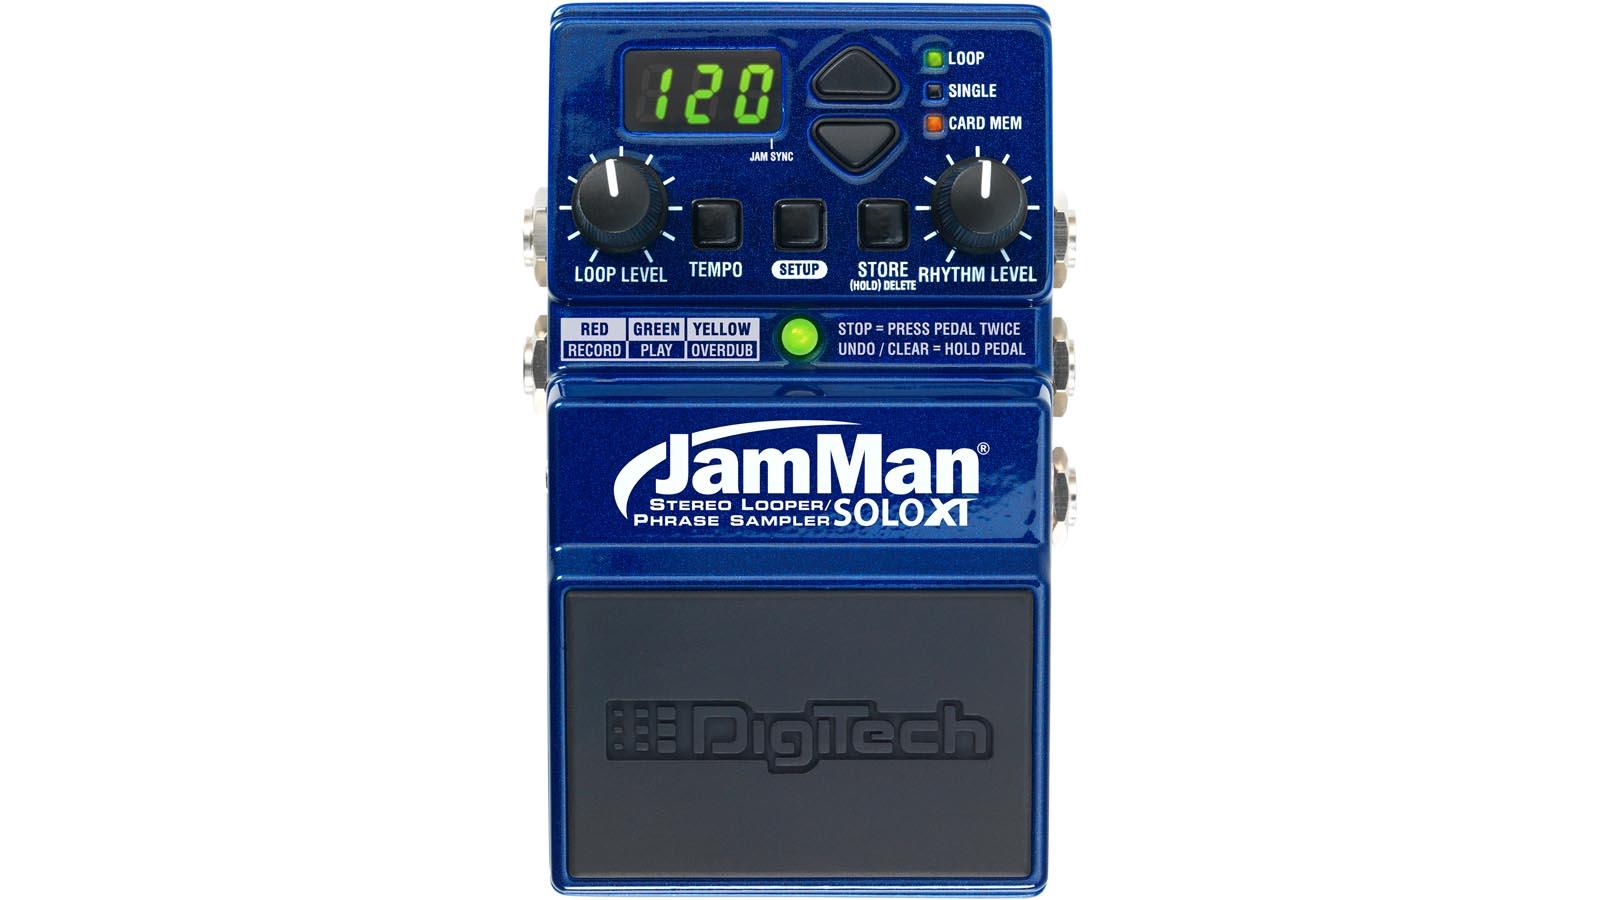 Digitech Jam Man Solo XT Stereo Looper